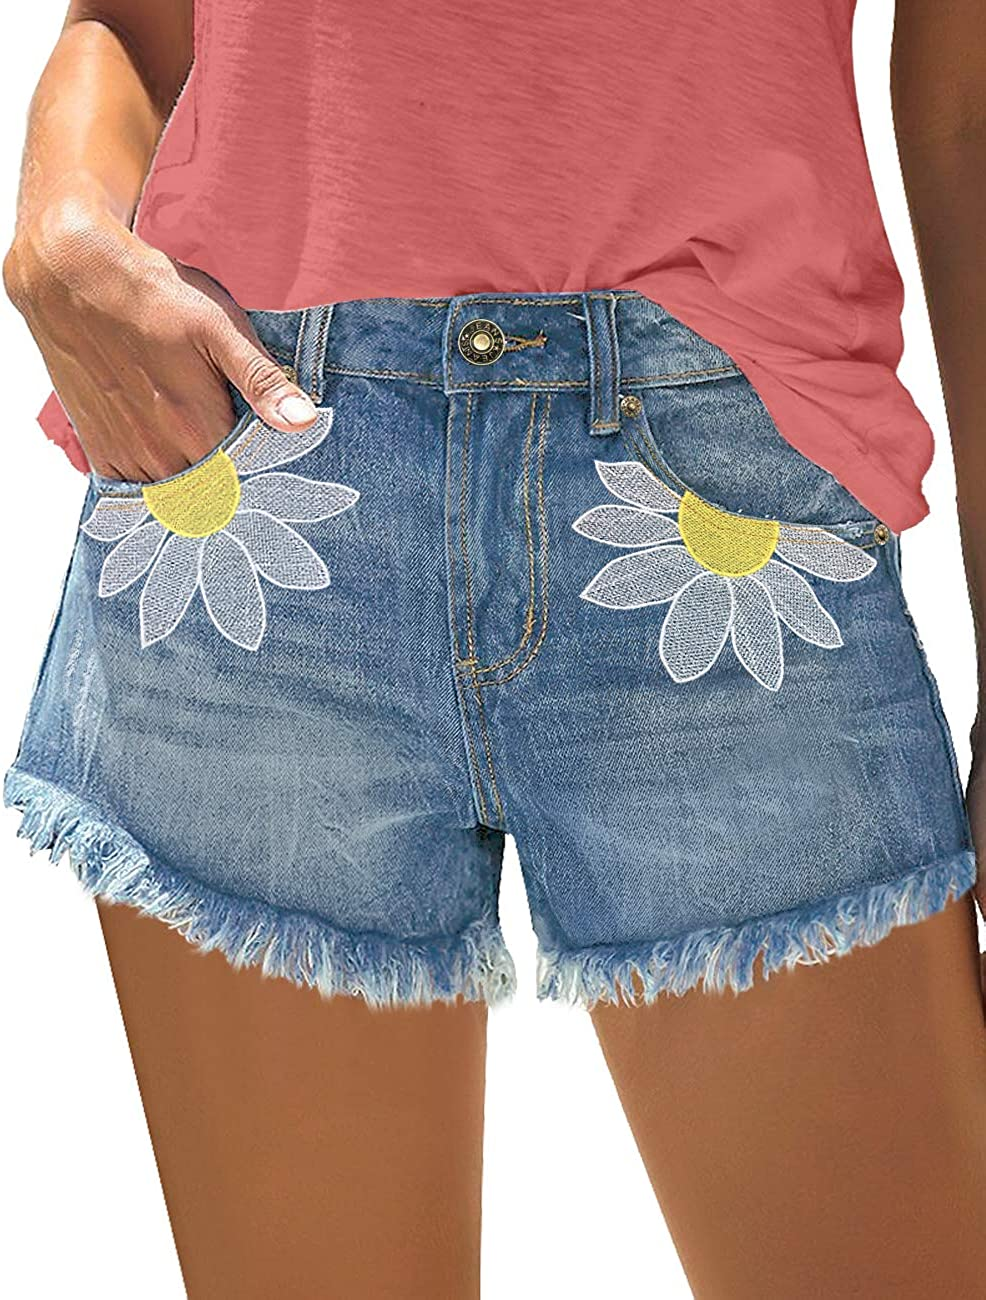 Womens Jean Shorts BLUE DENIM 4 Pockets SIZE 4 6 12 14